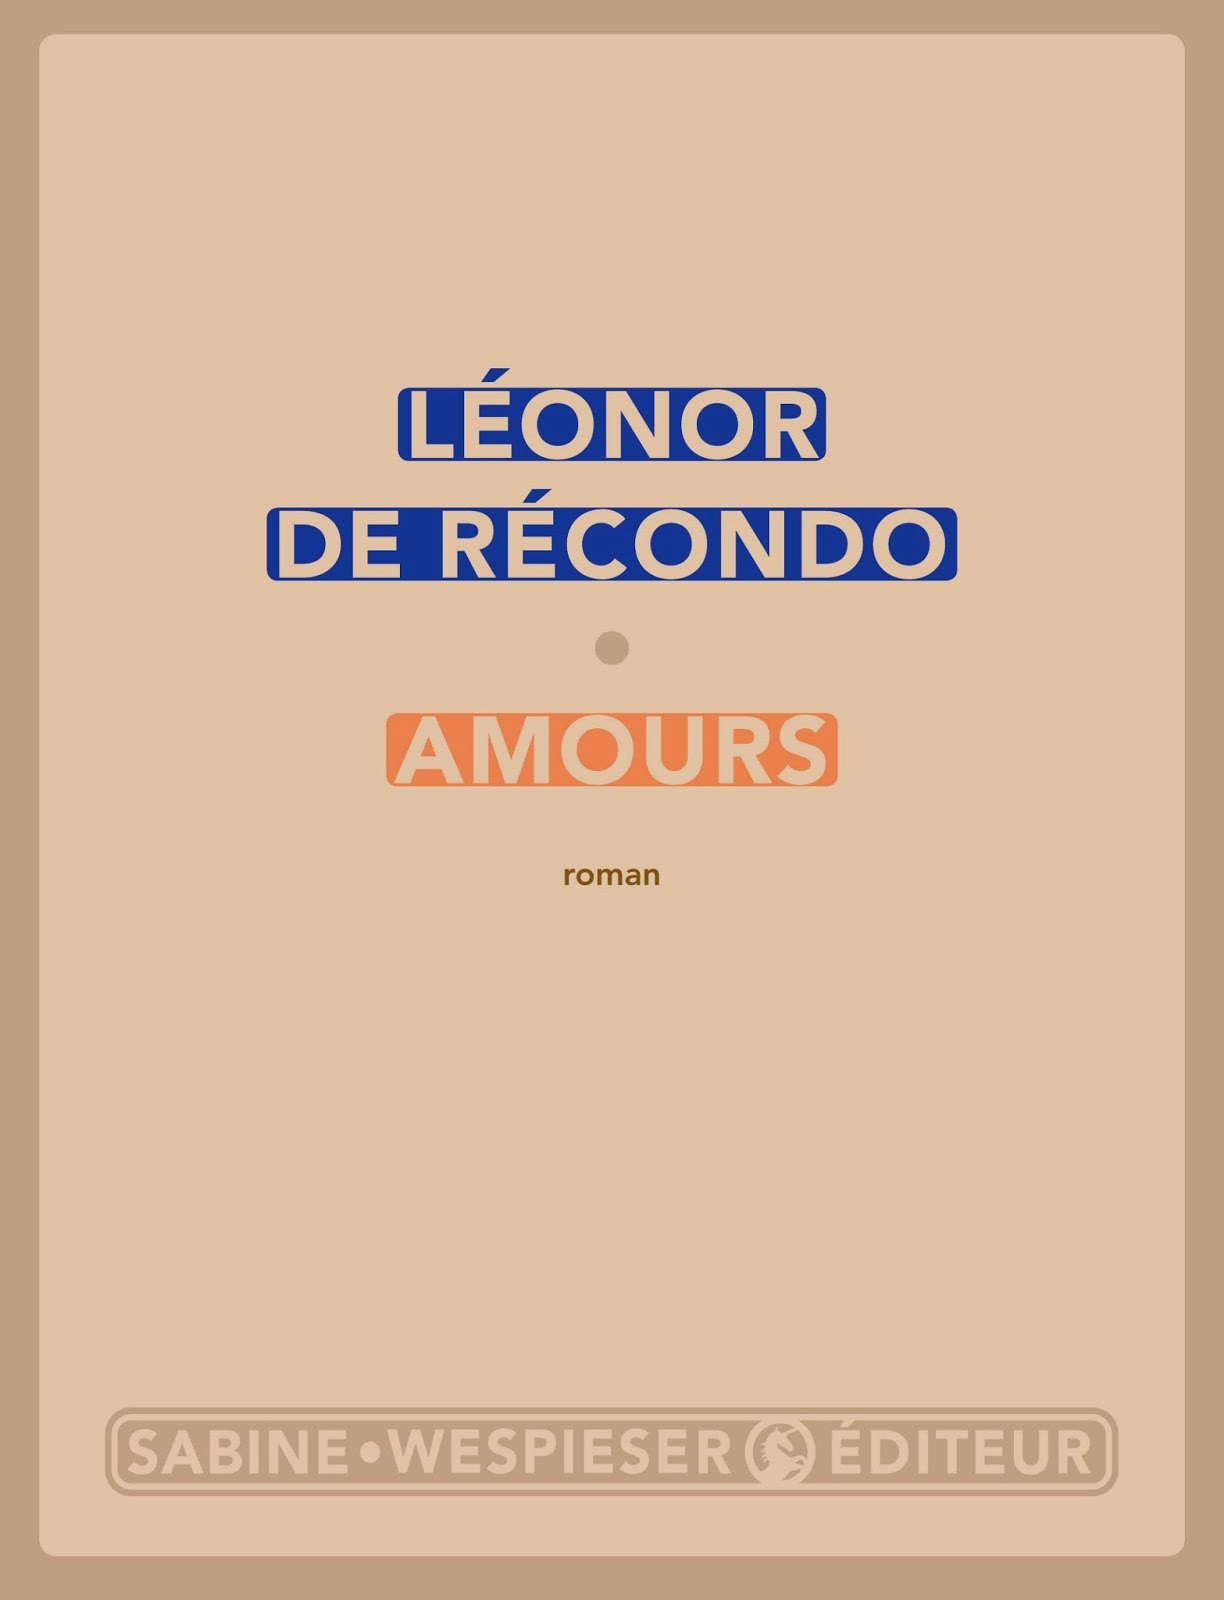 http://www.swediteur.com/extraits/149/amours.pdf